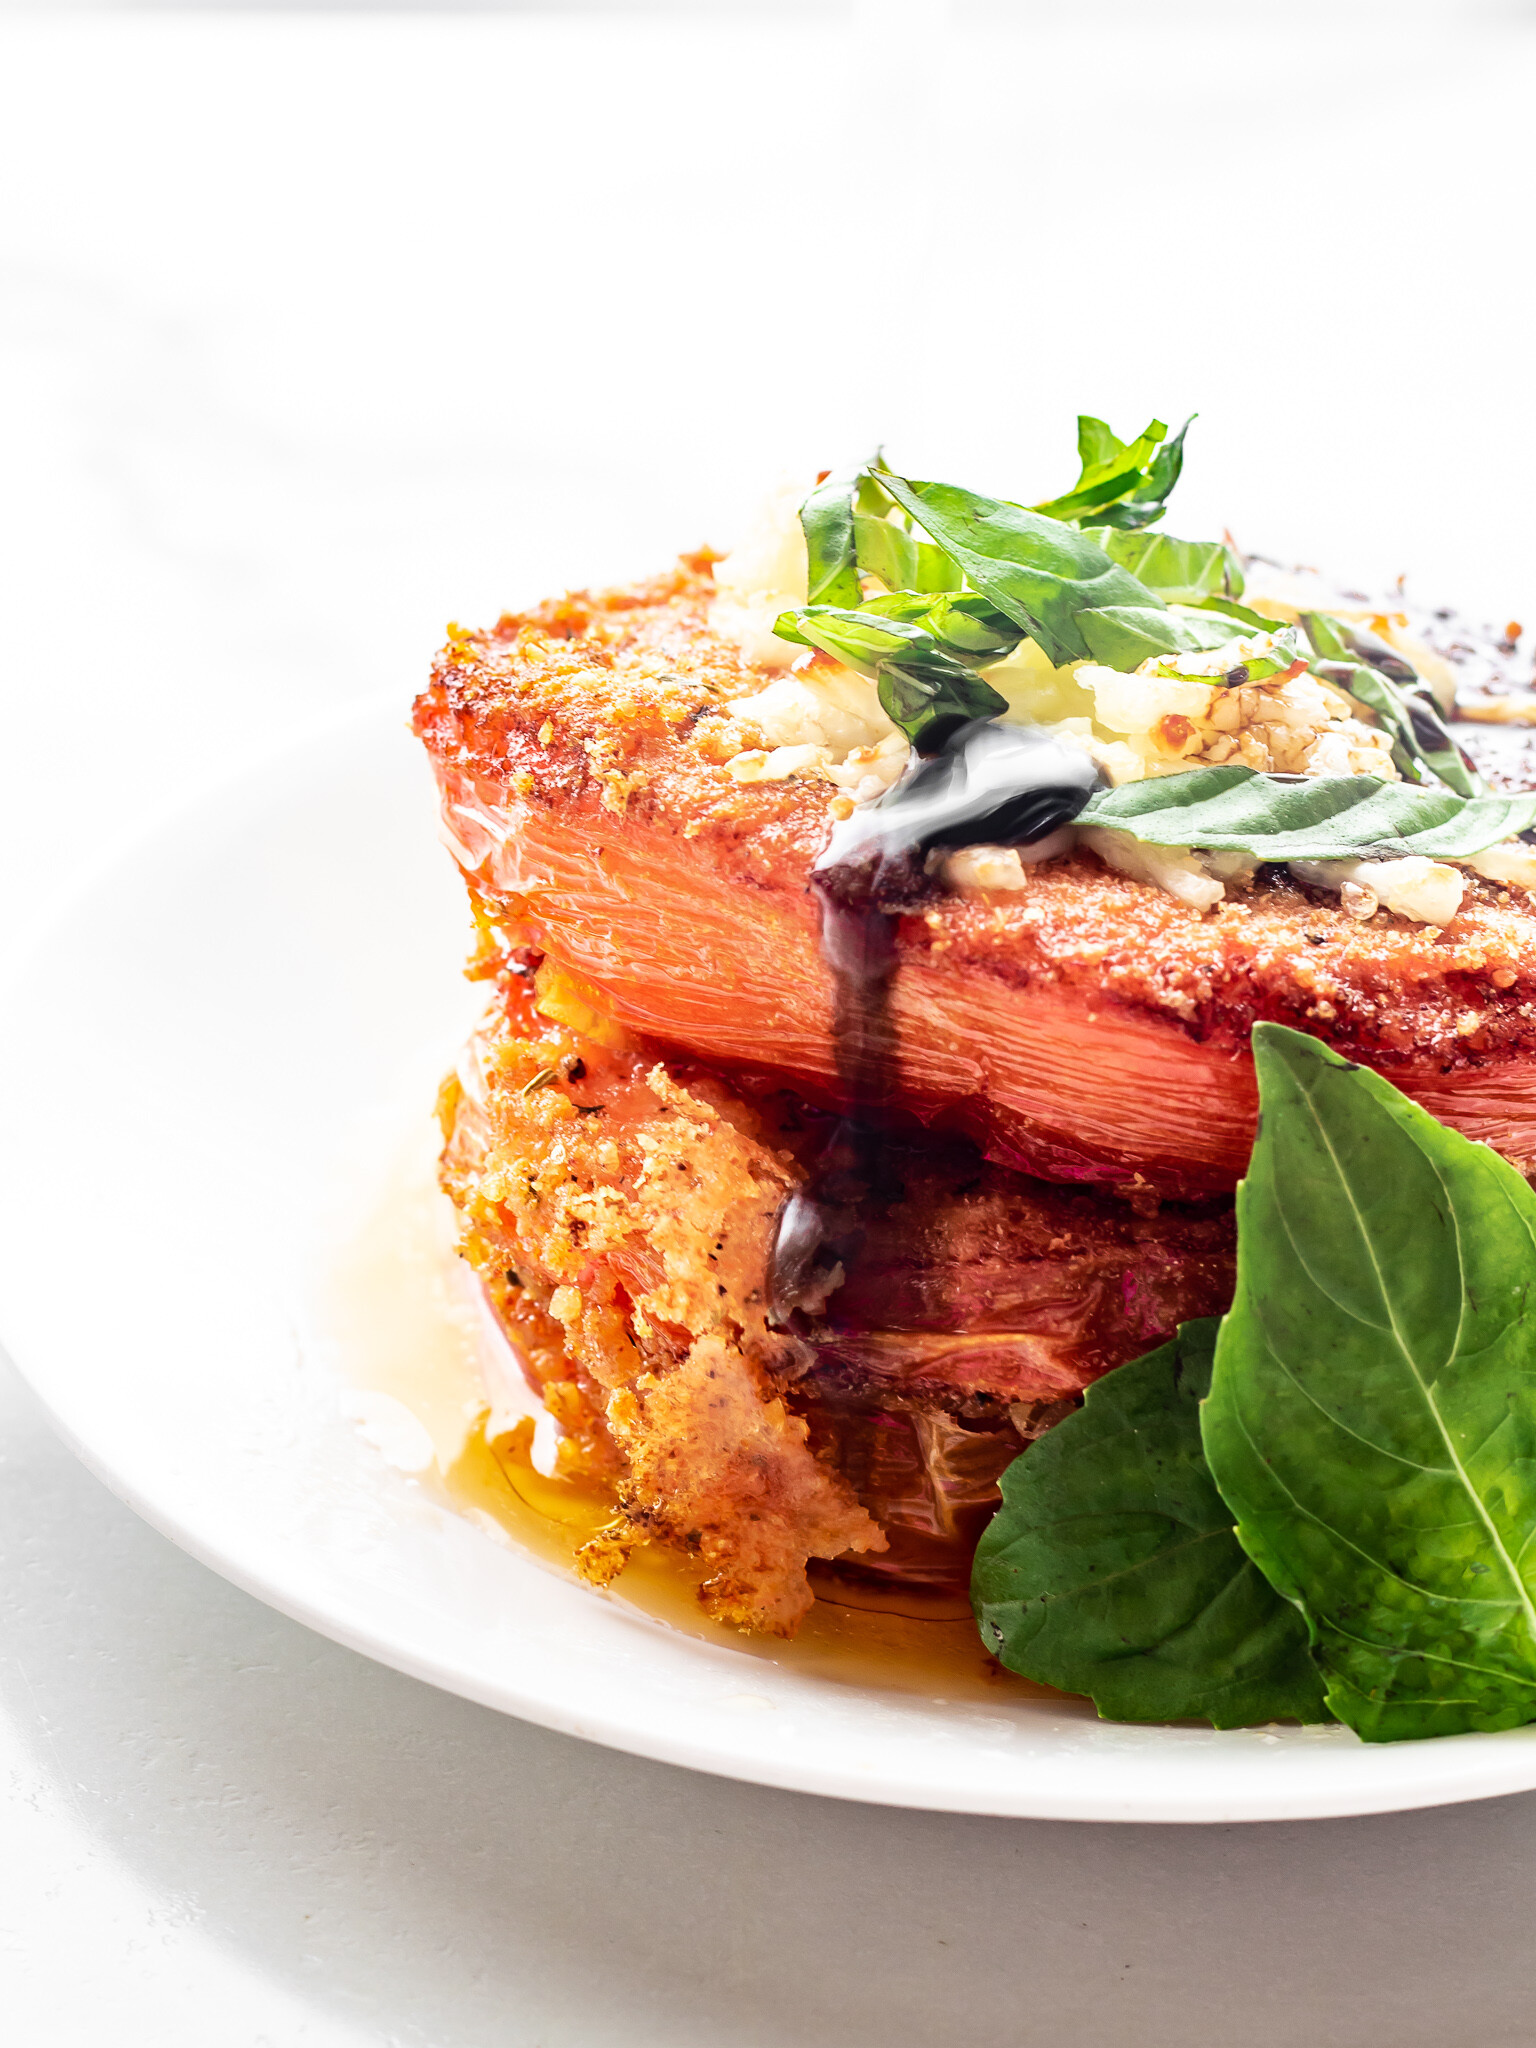 Low Carb, Keto Fried Tomatoes - Mozzarella, Basil & Balsamic Reduction